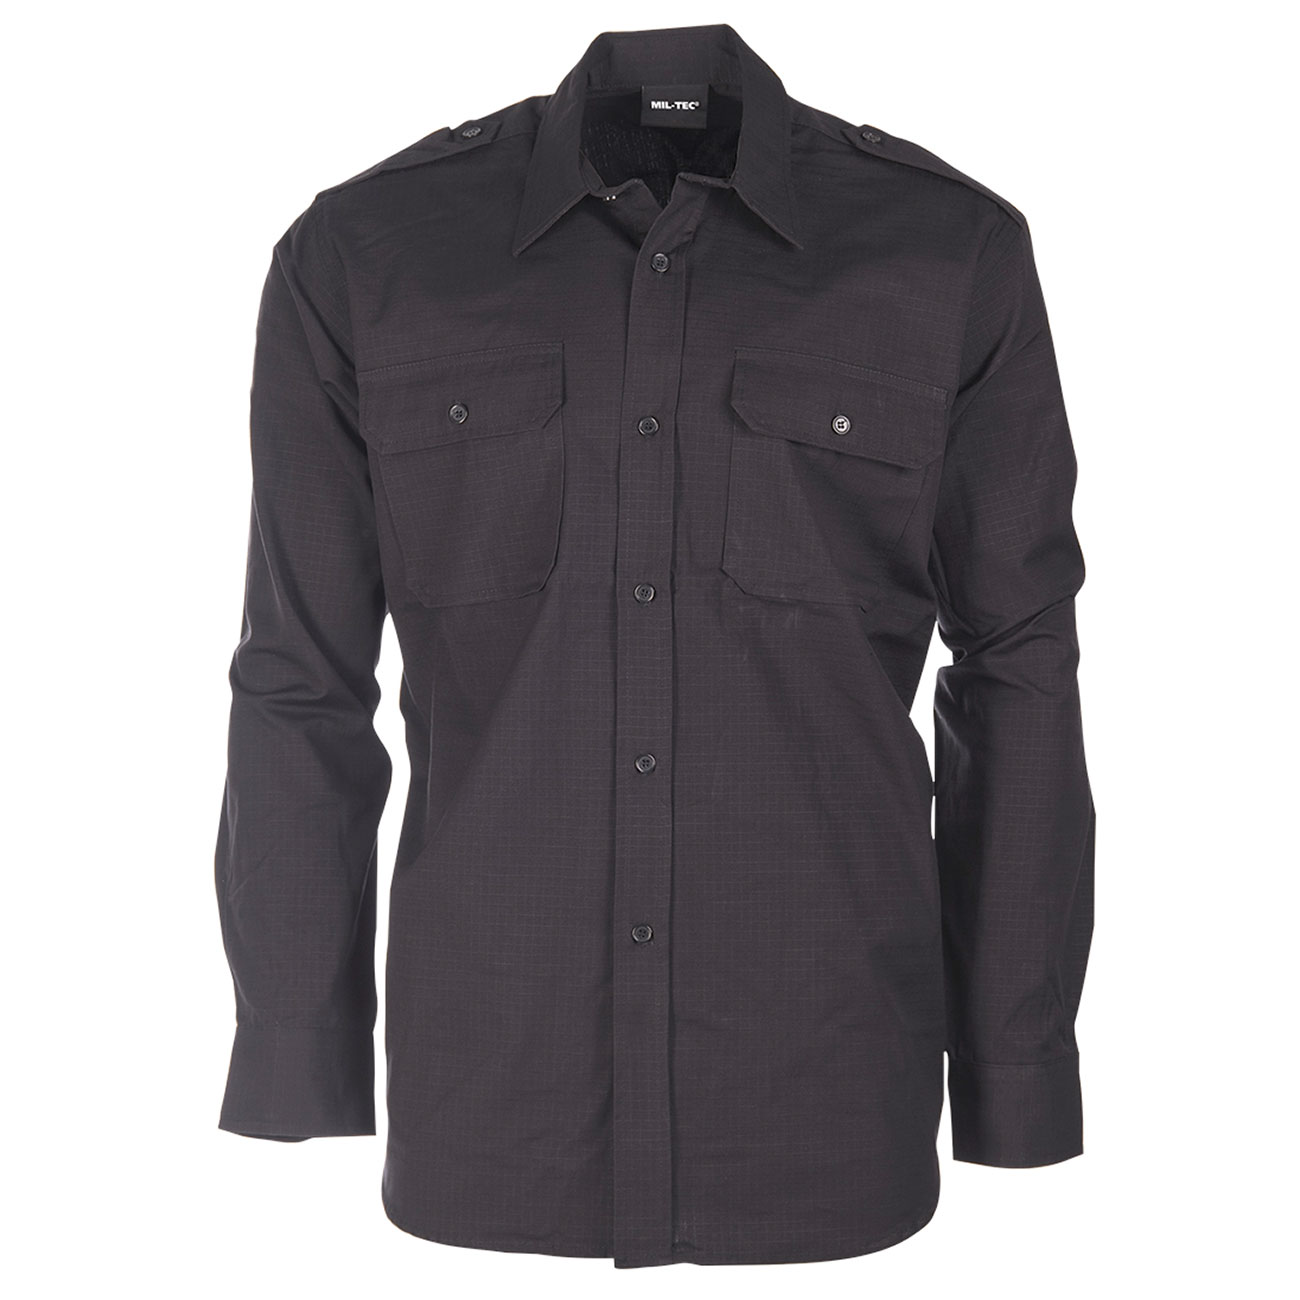 innovative design 92f26 b932c Mil-Tec Ripstop Hemd langarm schwarz